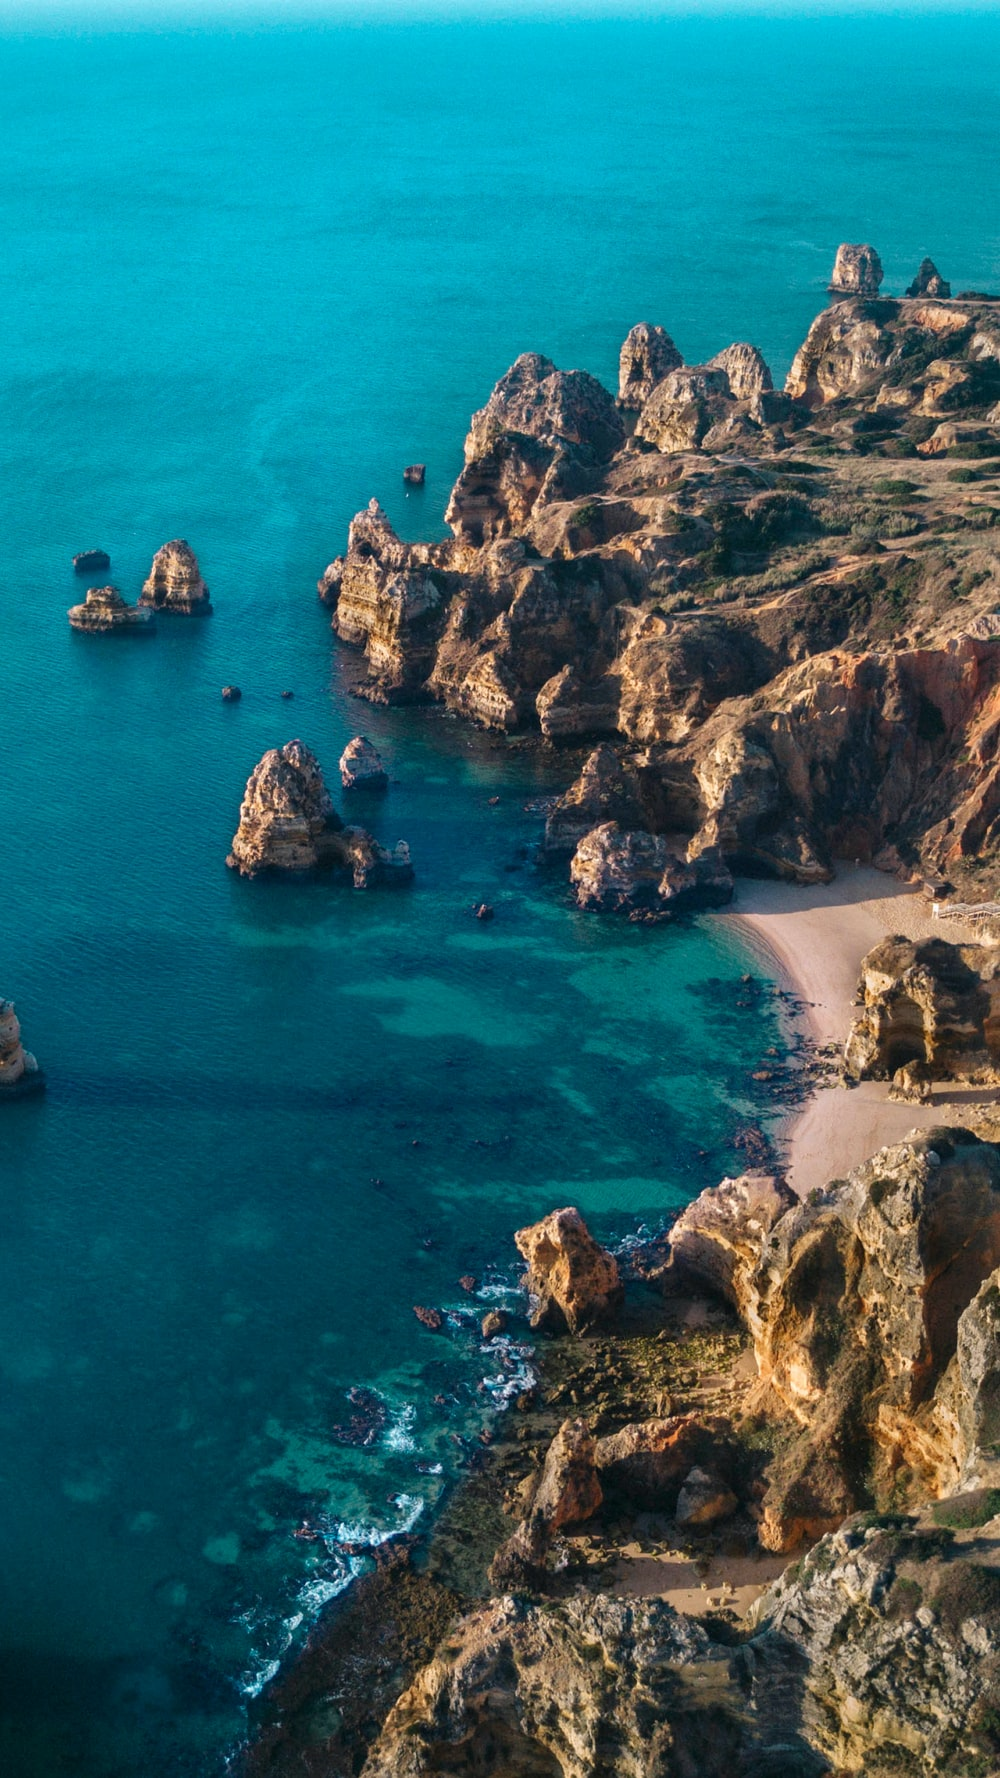 brown rocky cliff in beach